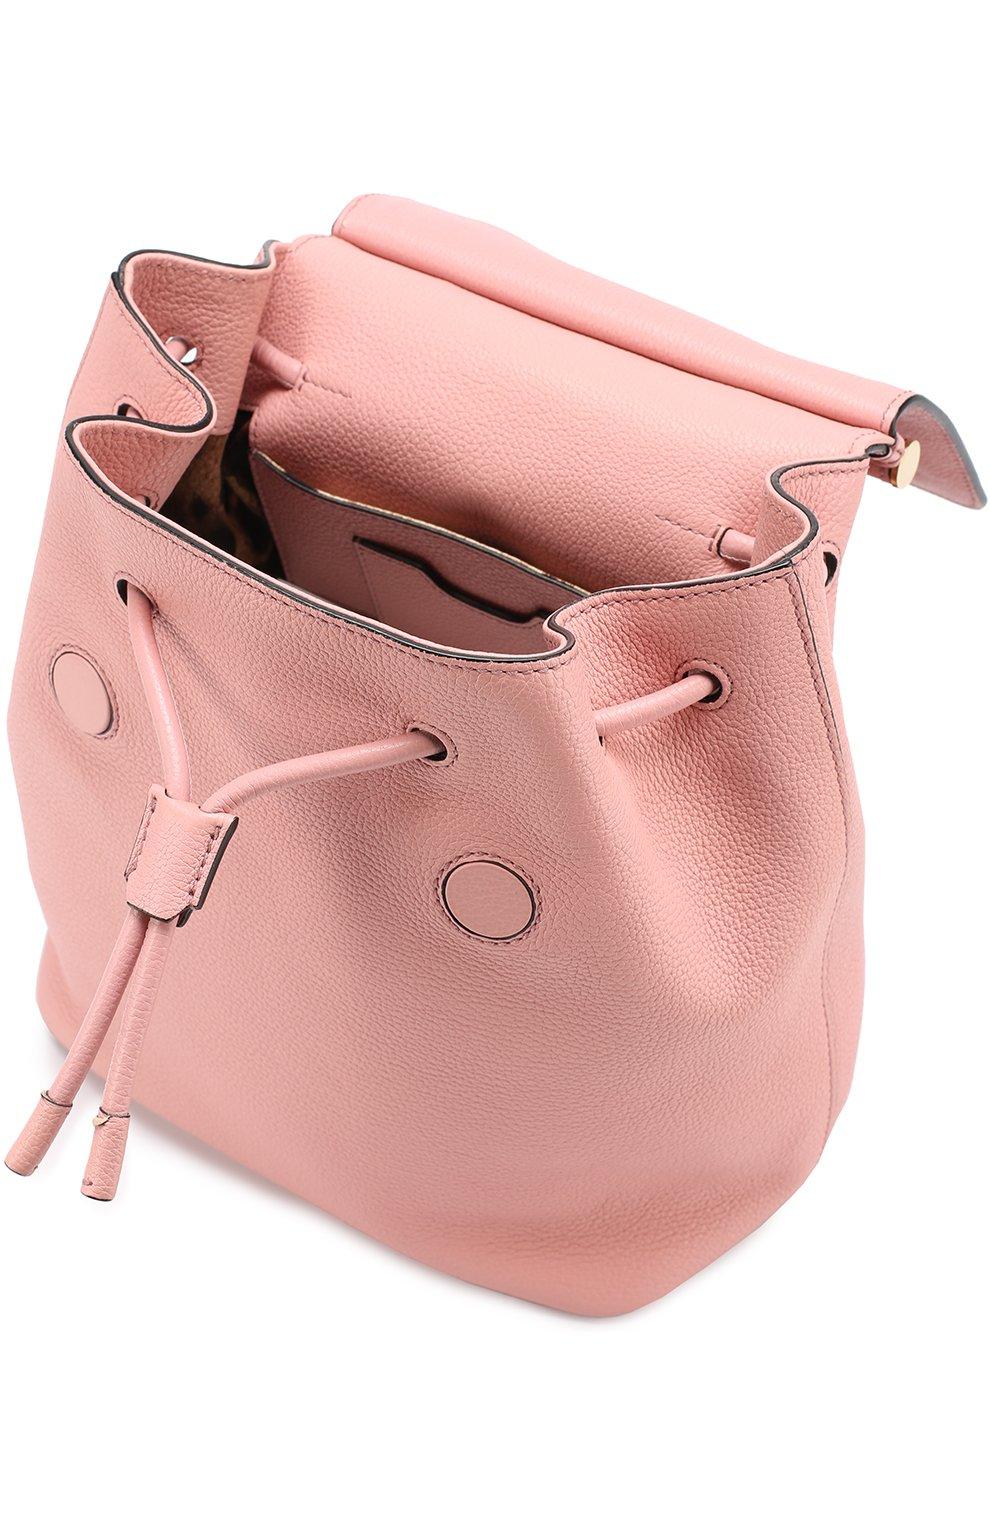 Рюкзак Sicily с клапаном Dolce & Gabbana розовый   Фото №3